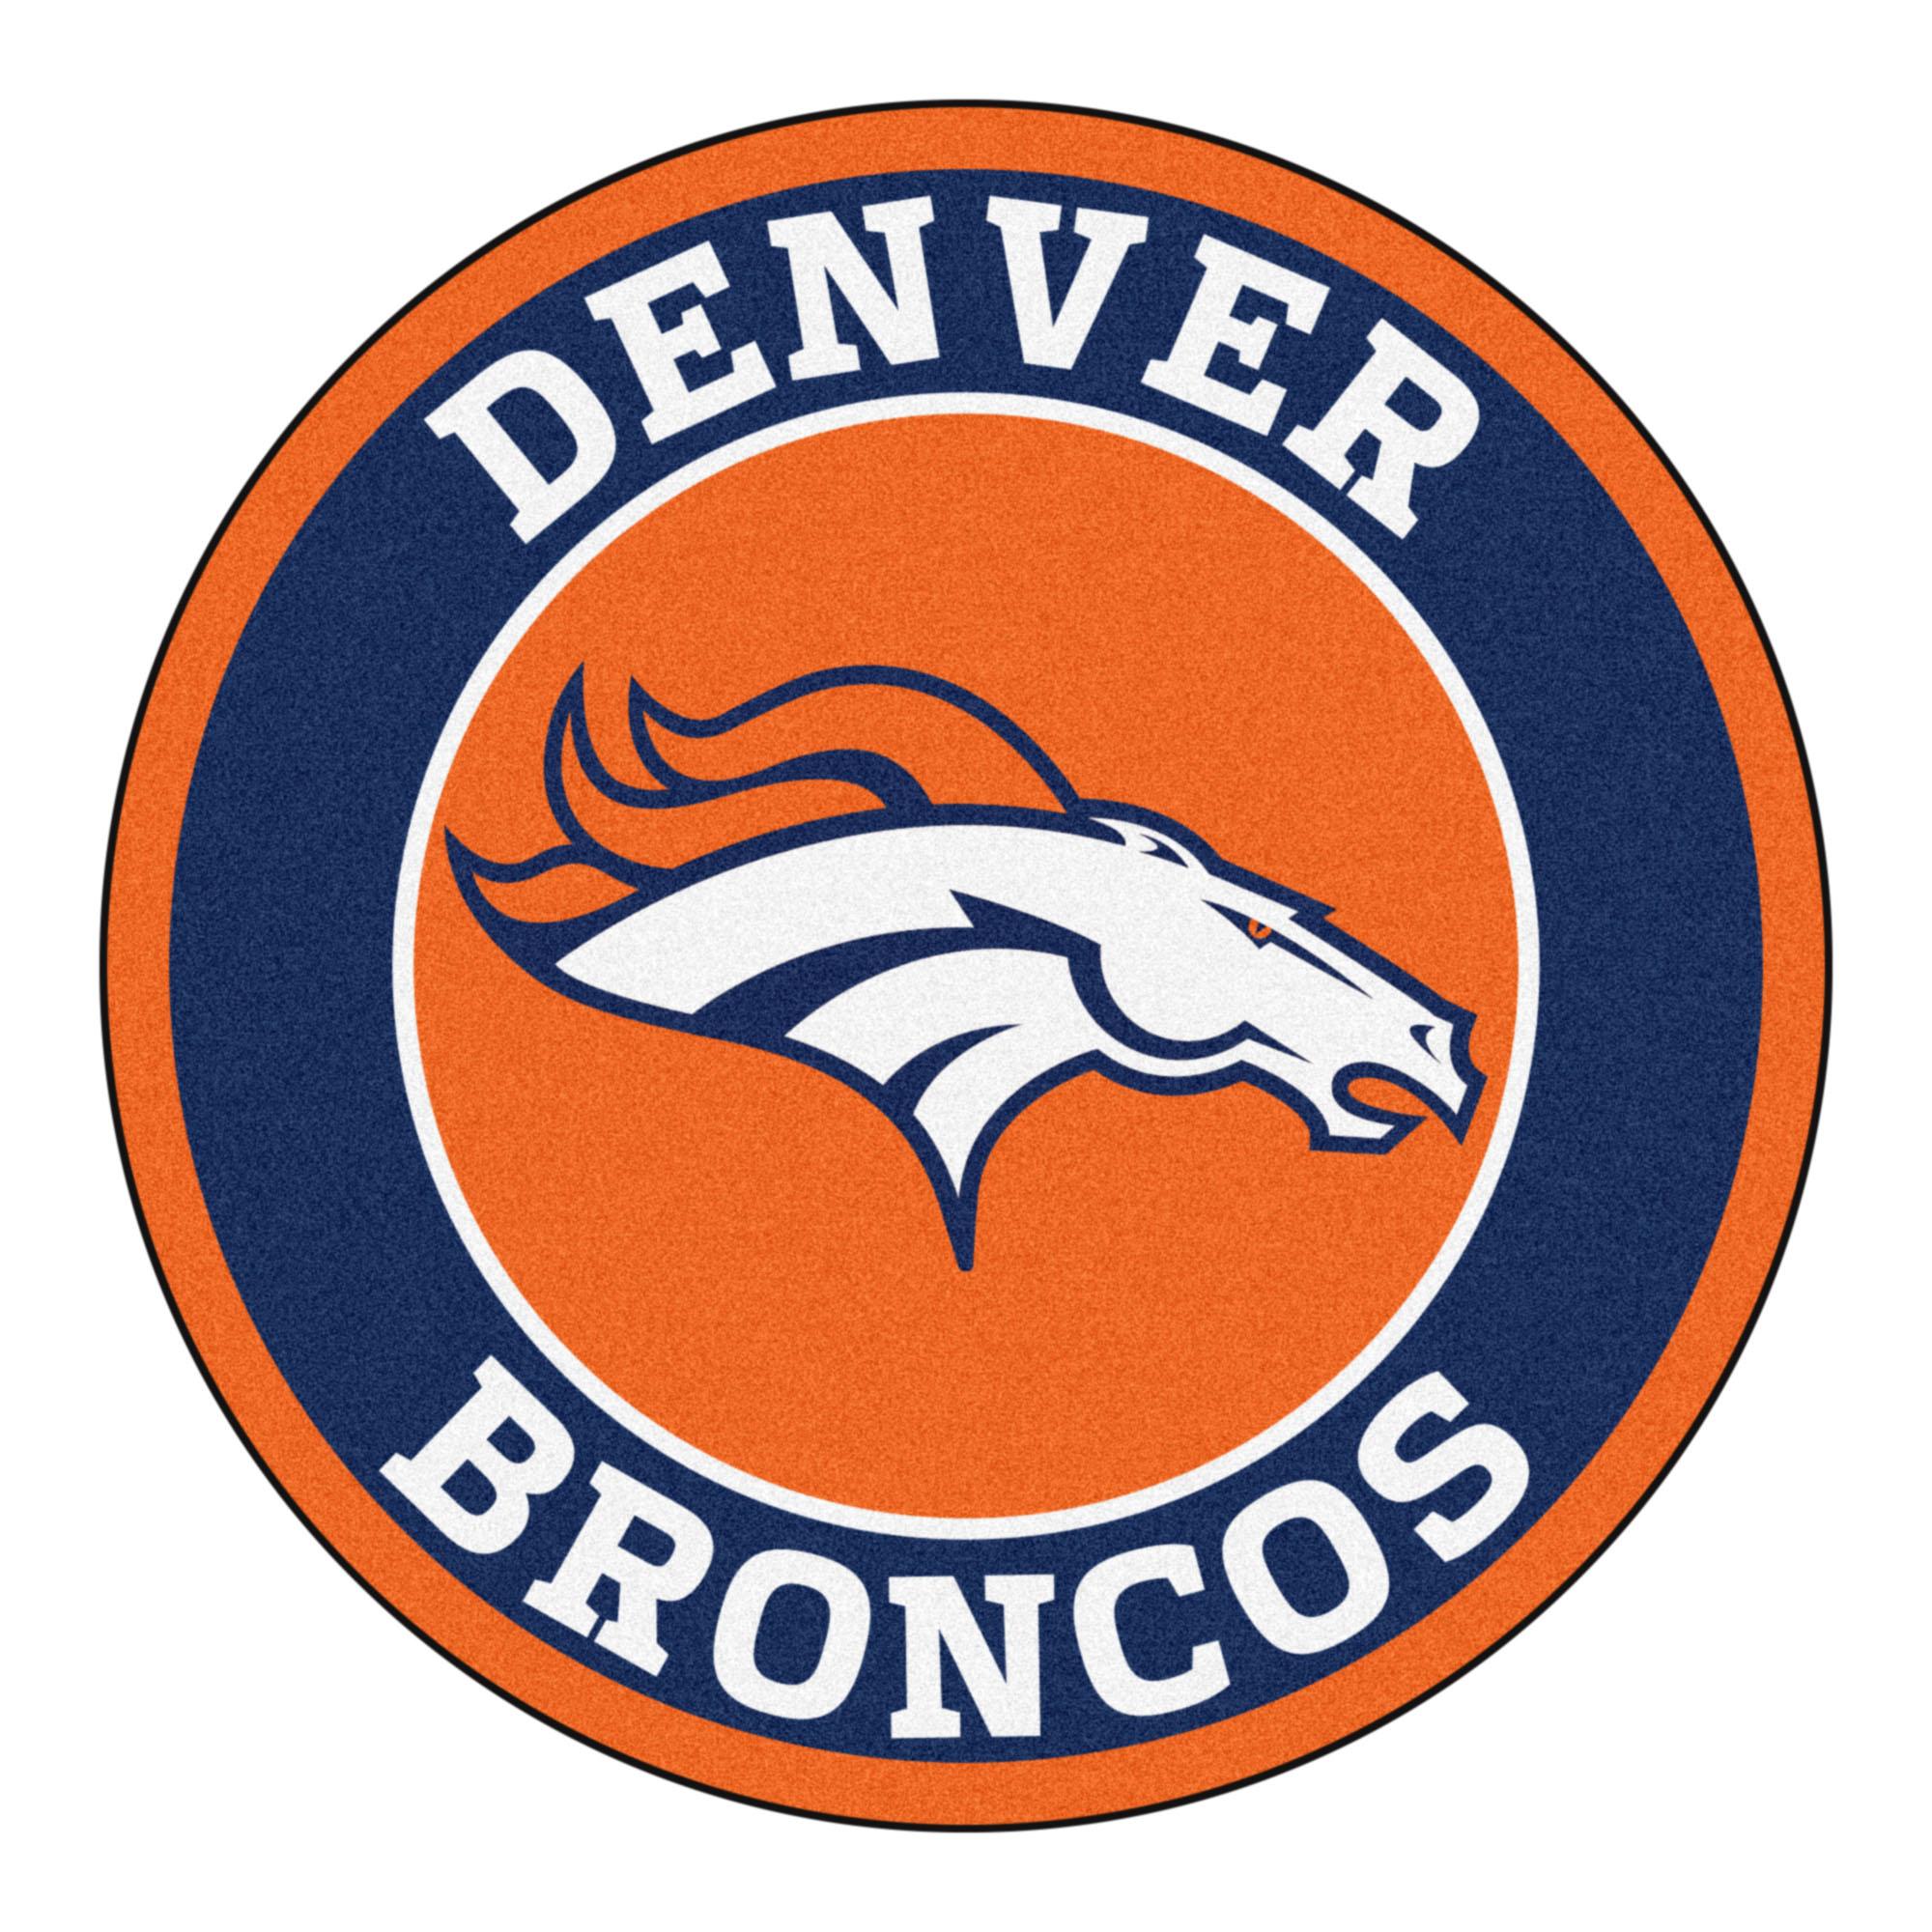 2000x2000 Beautiful Denver Broncos Emblem 2 14 14012d Nfl Logo 6628 Paper